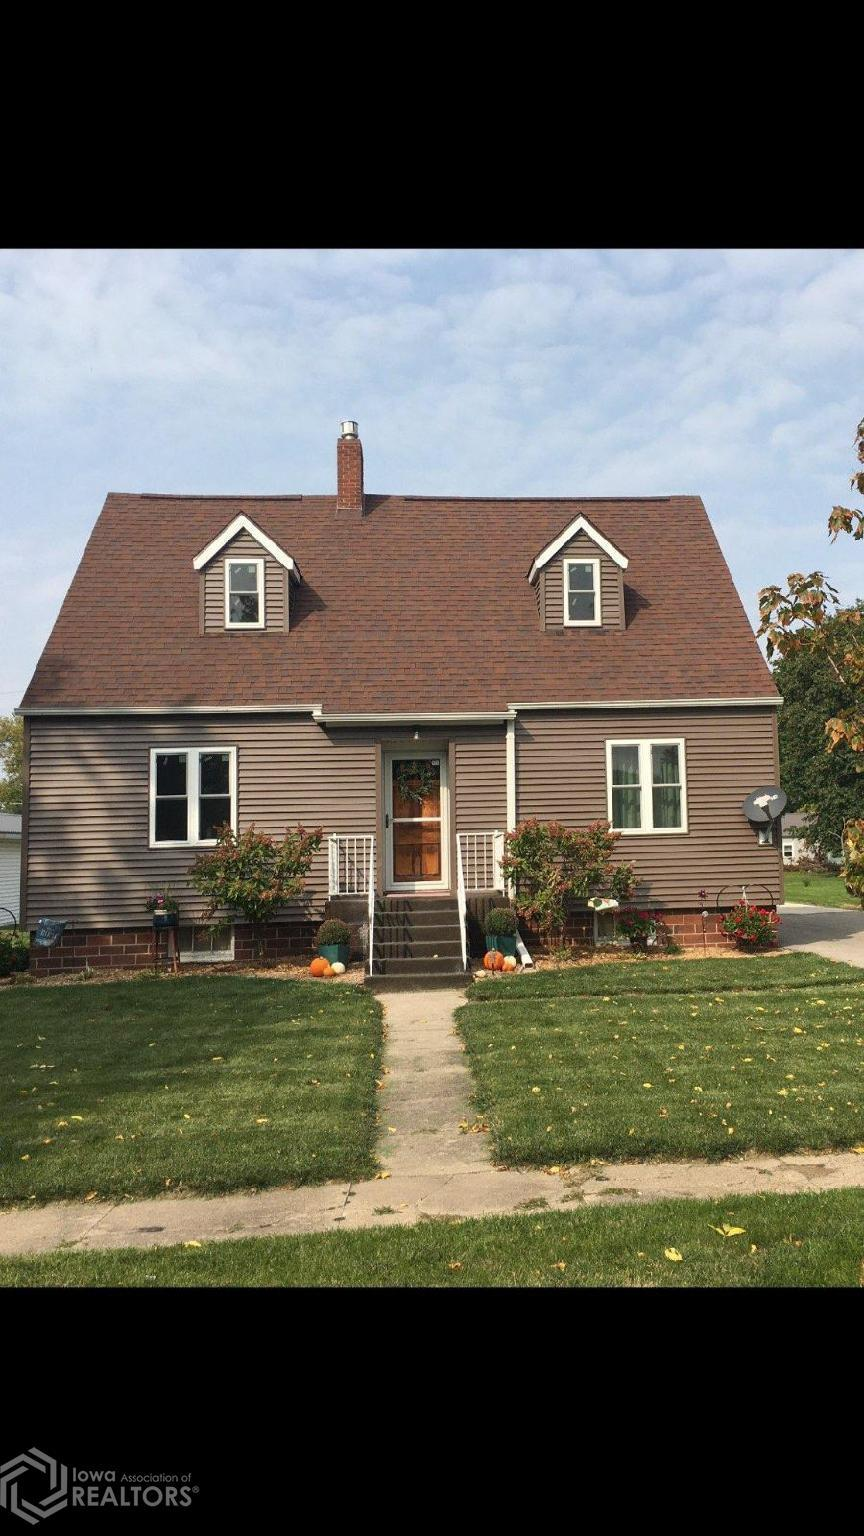 214 Maple, Hubbard, Iowa 50122-7723, 3 Bedrooms Bedrooms, ,1 BathroomBathrooms,Single Family,For Sale,Maple,5740633